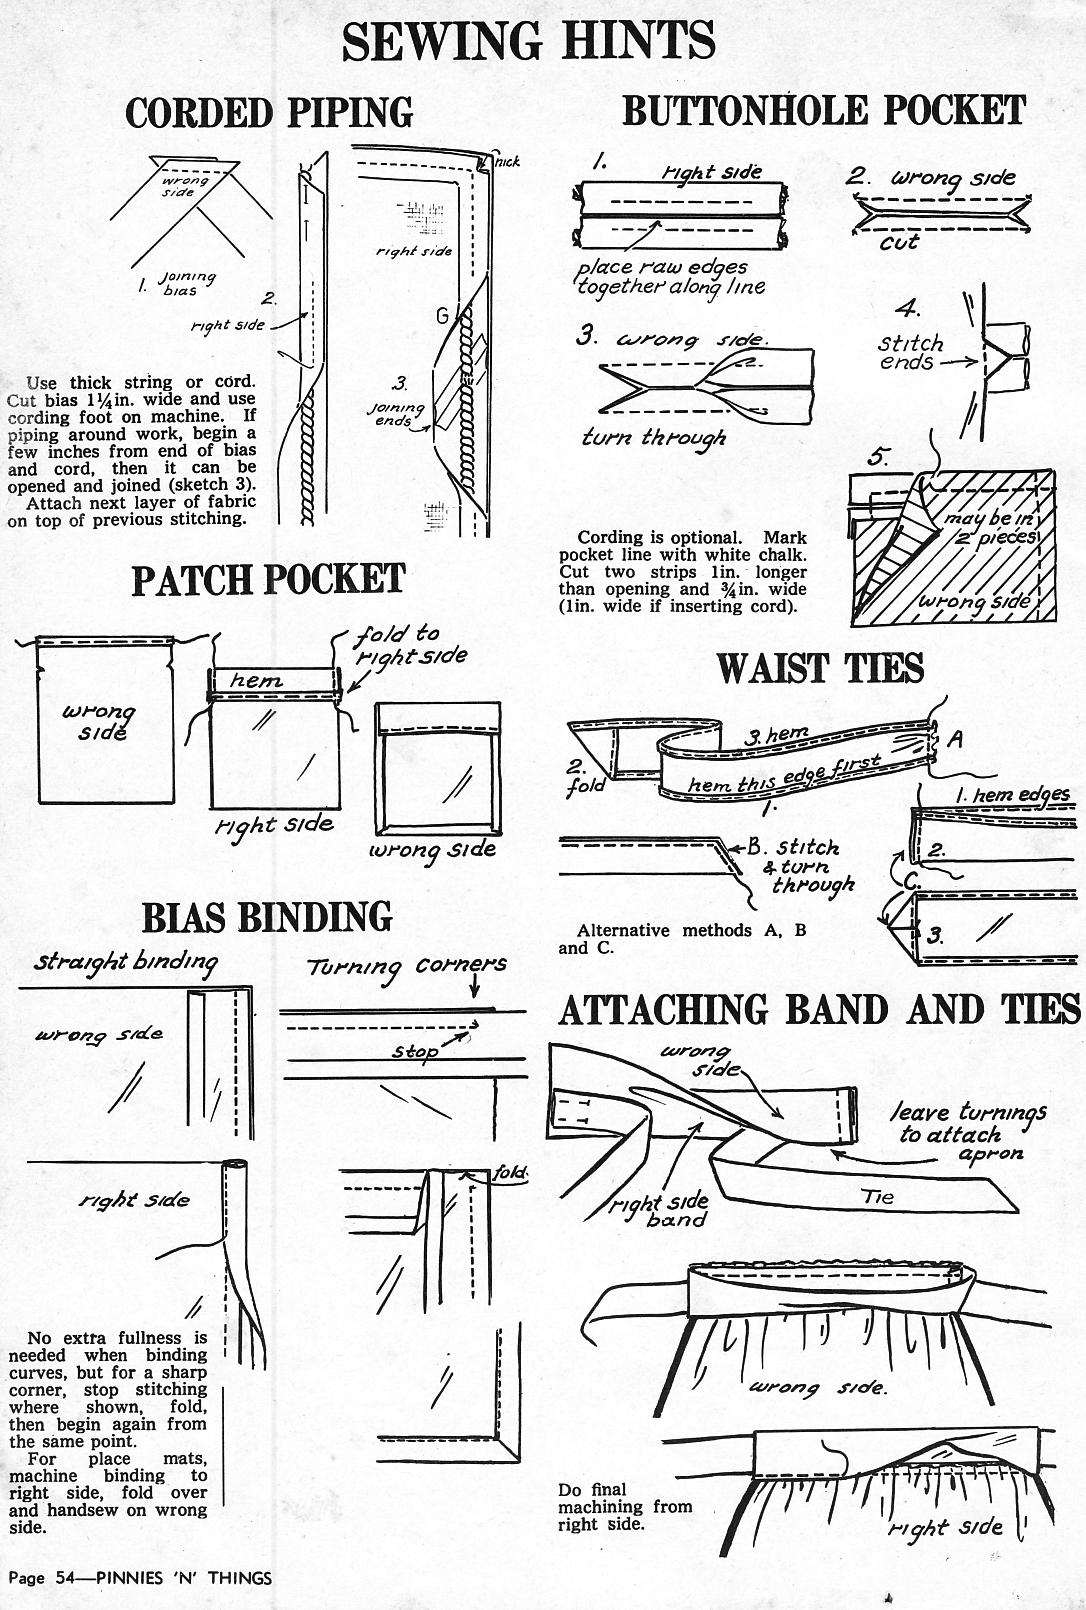 White apron tape - Bias Tape On Corners Piping Pockets Apron Waist